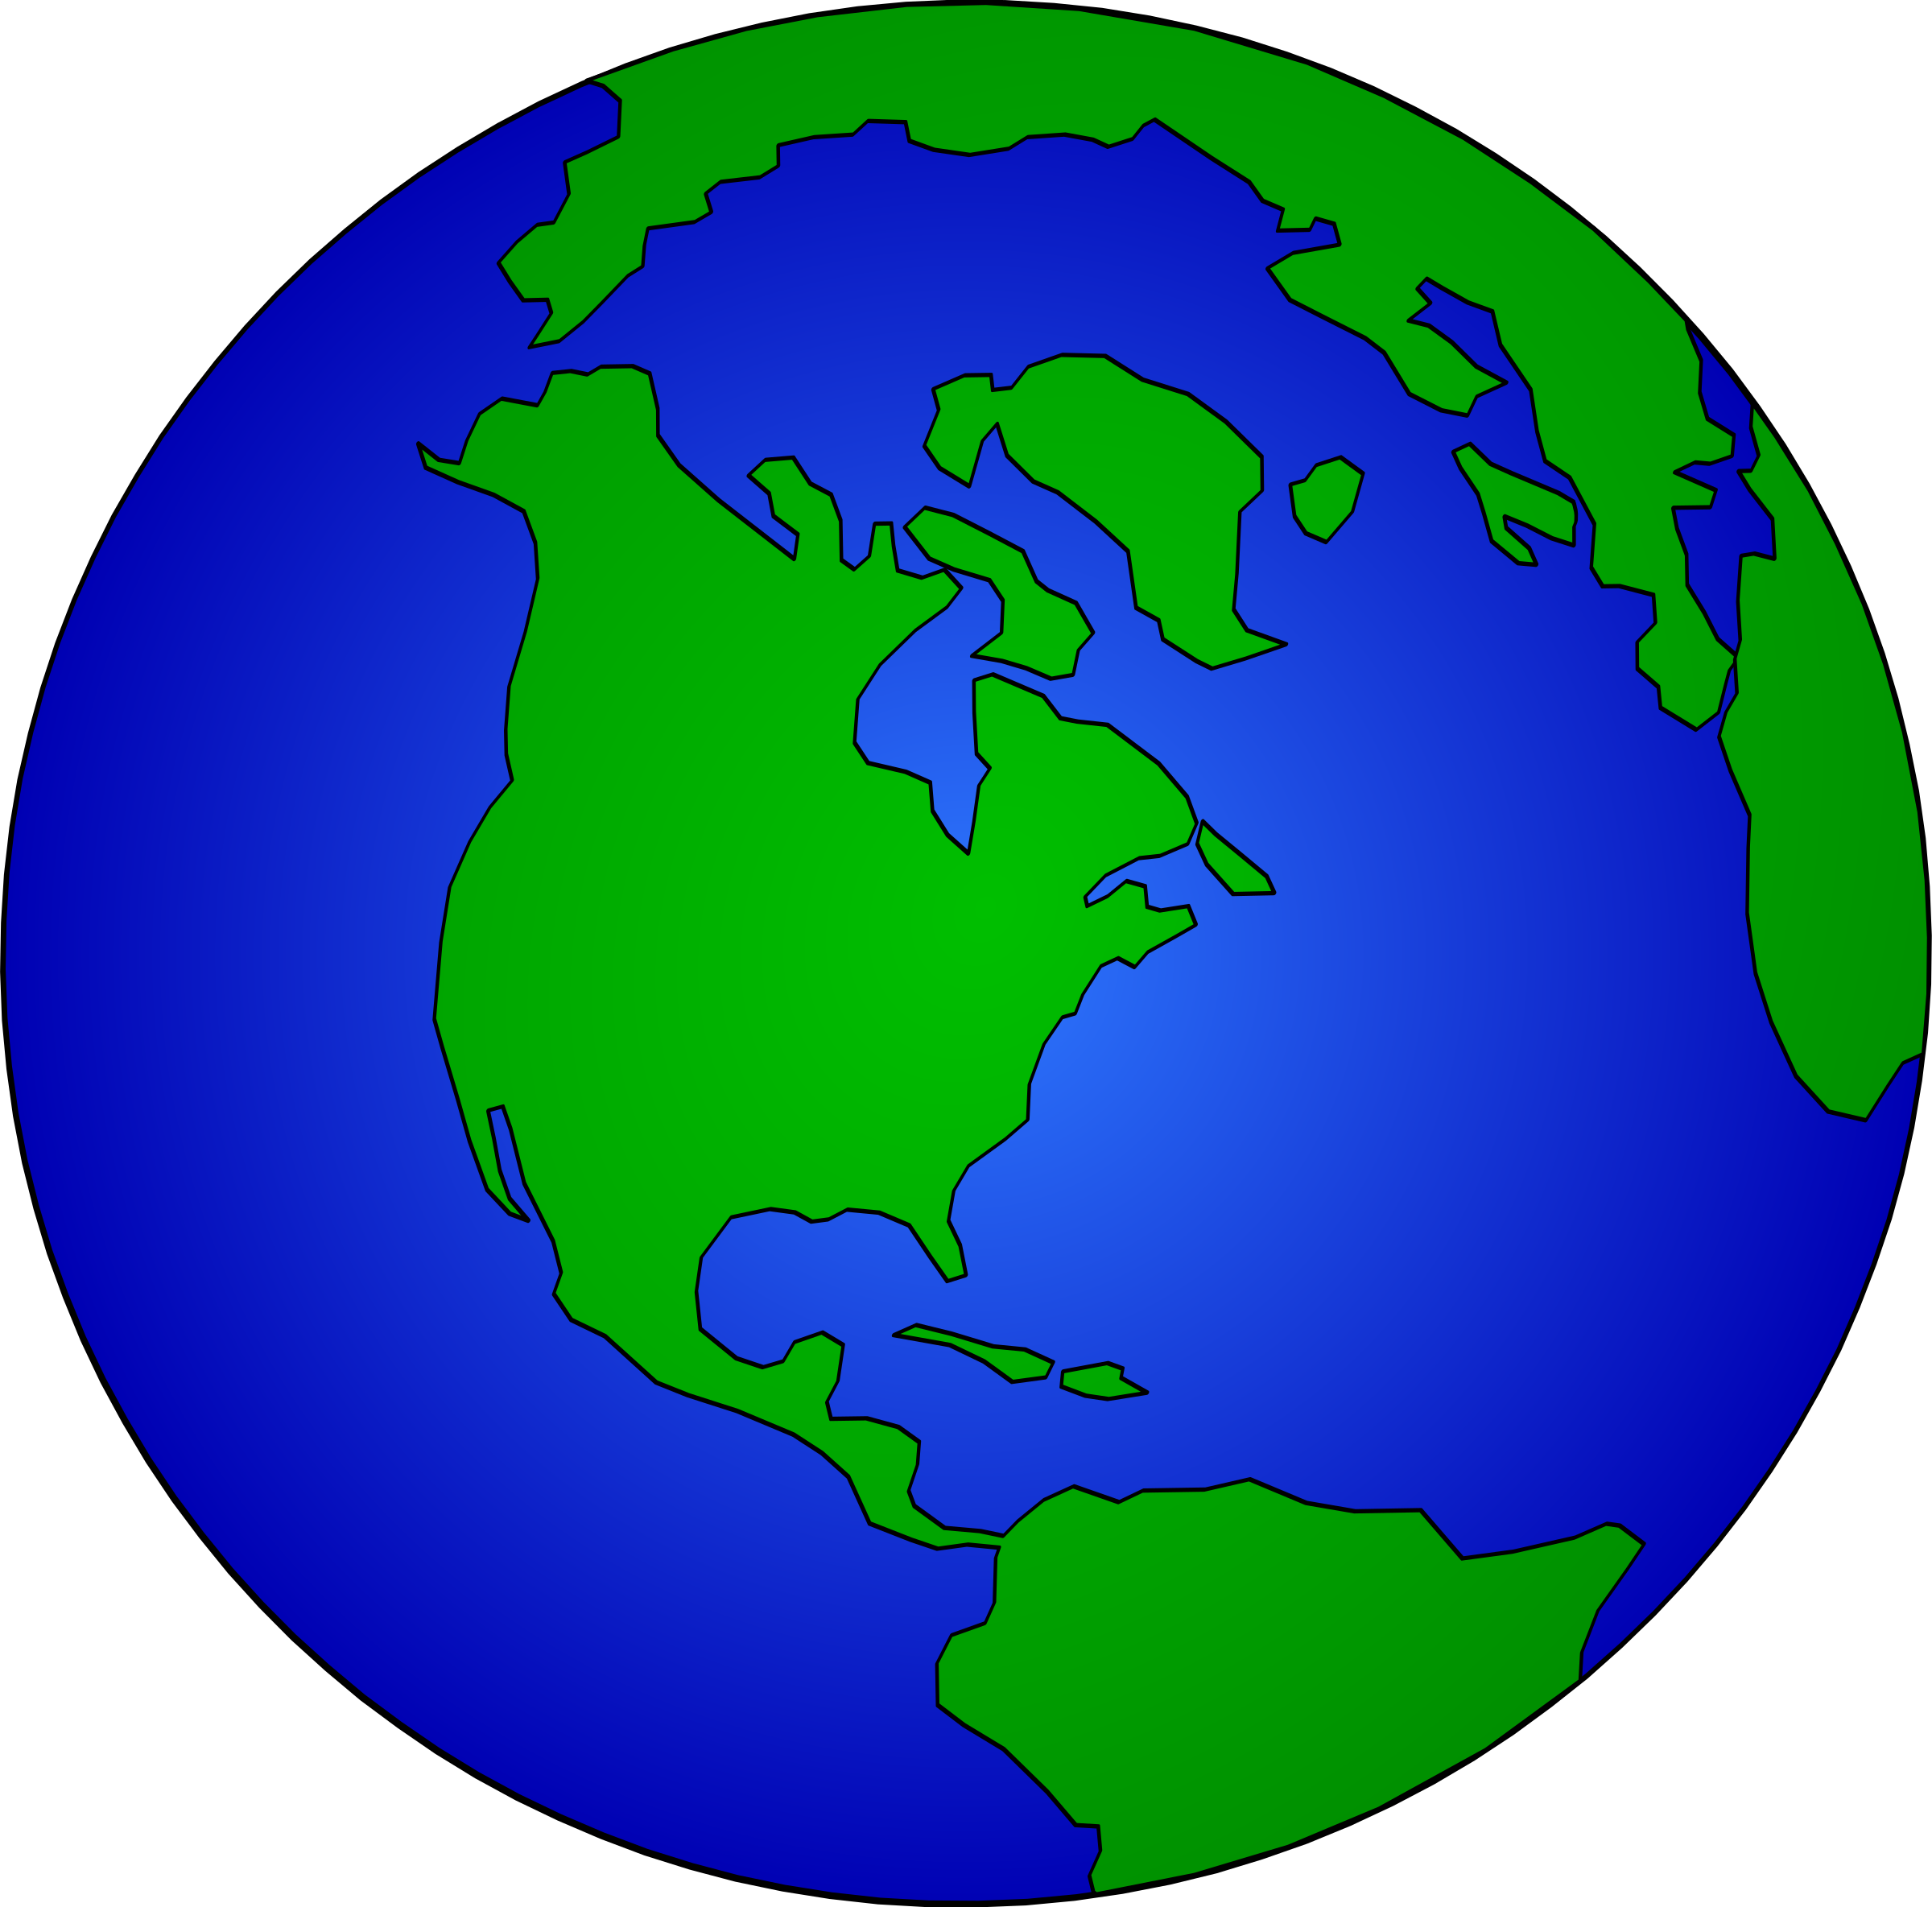 Earth globe dan gerhrad. Planets clipart order